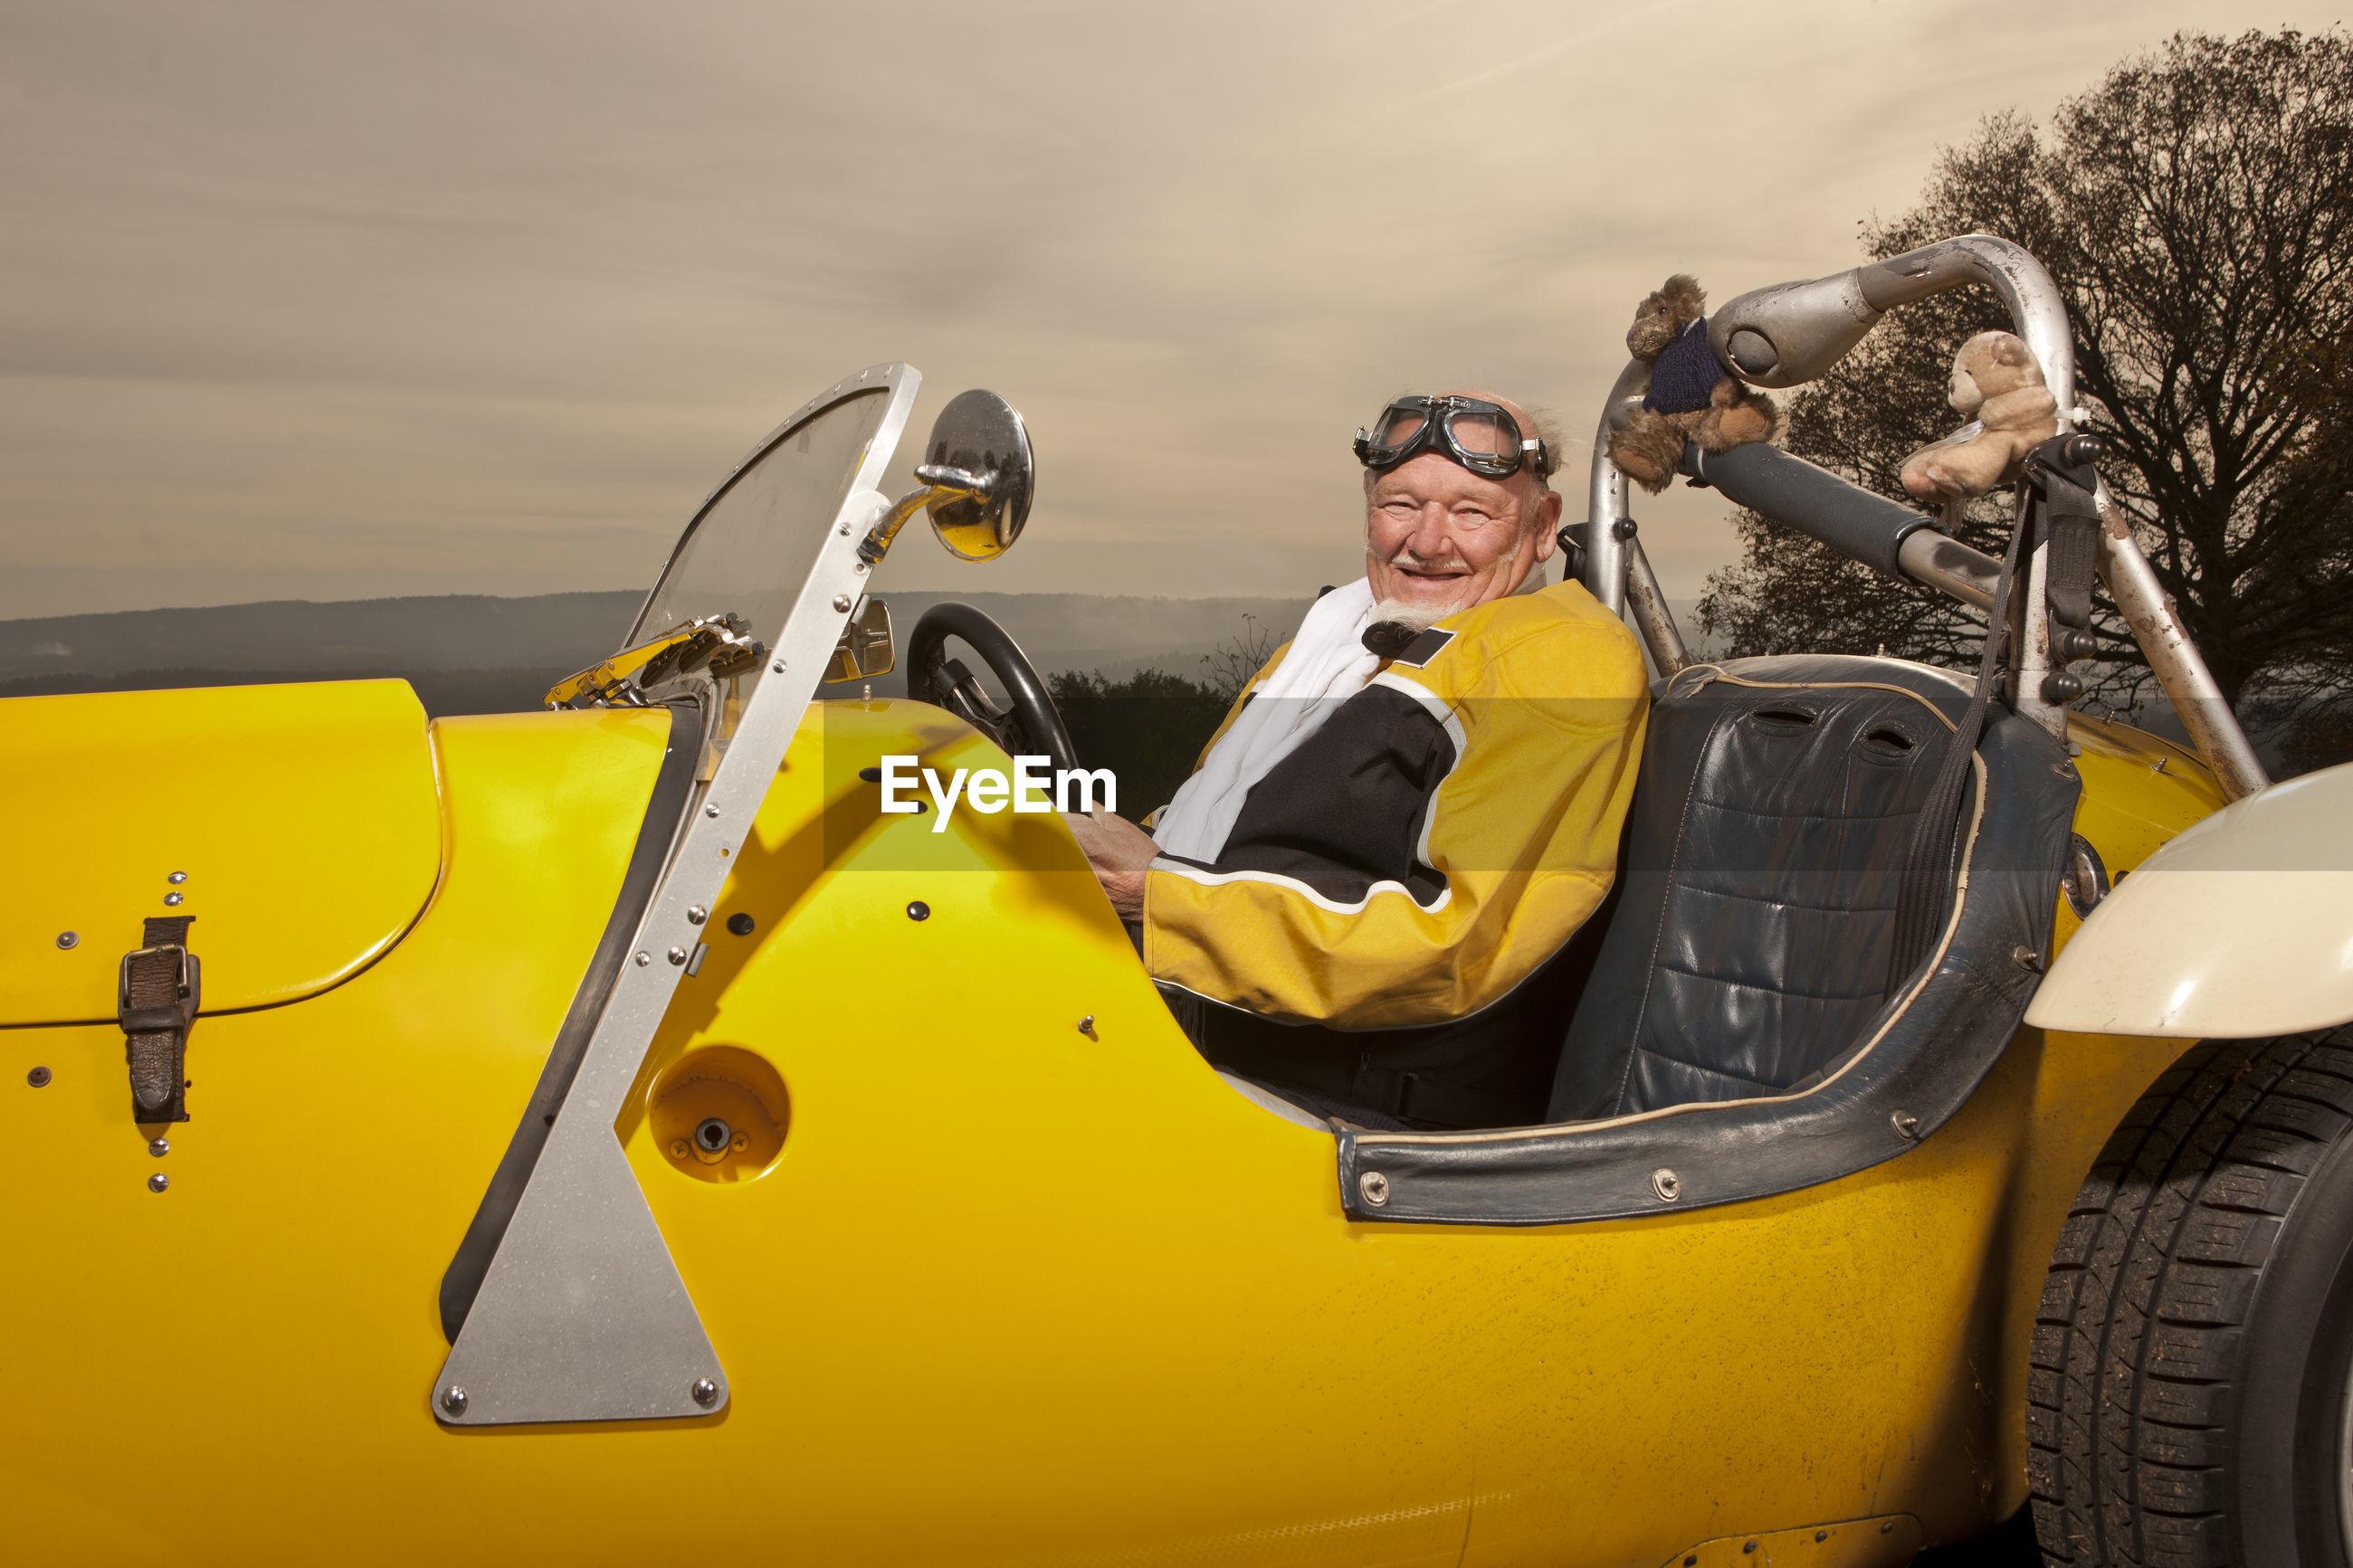 PORTRAIT OF HAPPY MAN SITTING ON YELLOW CART